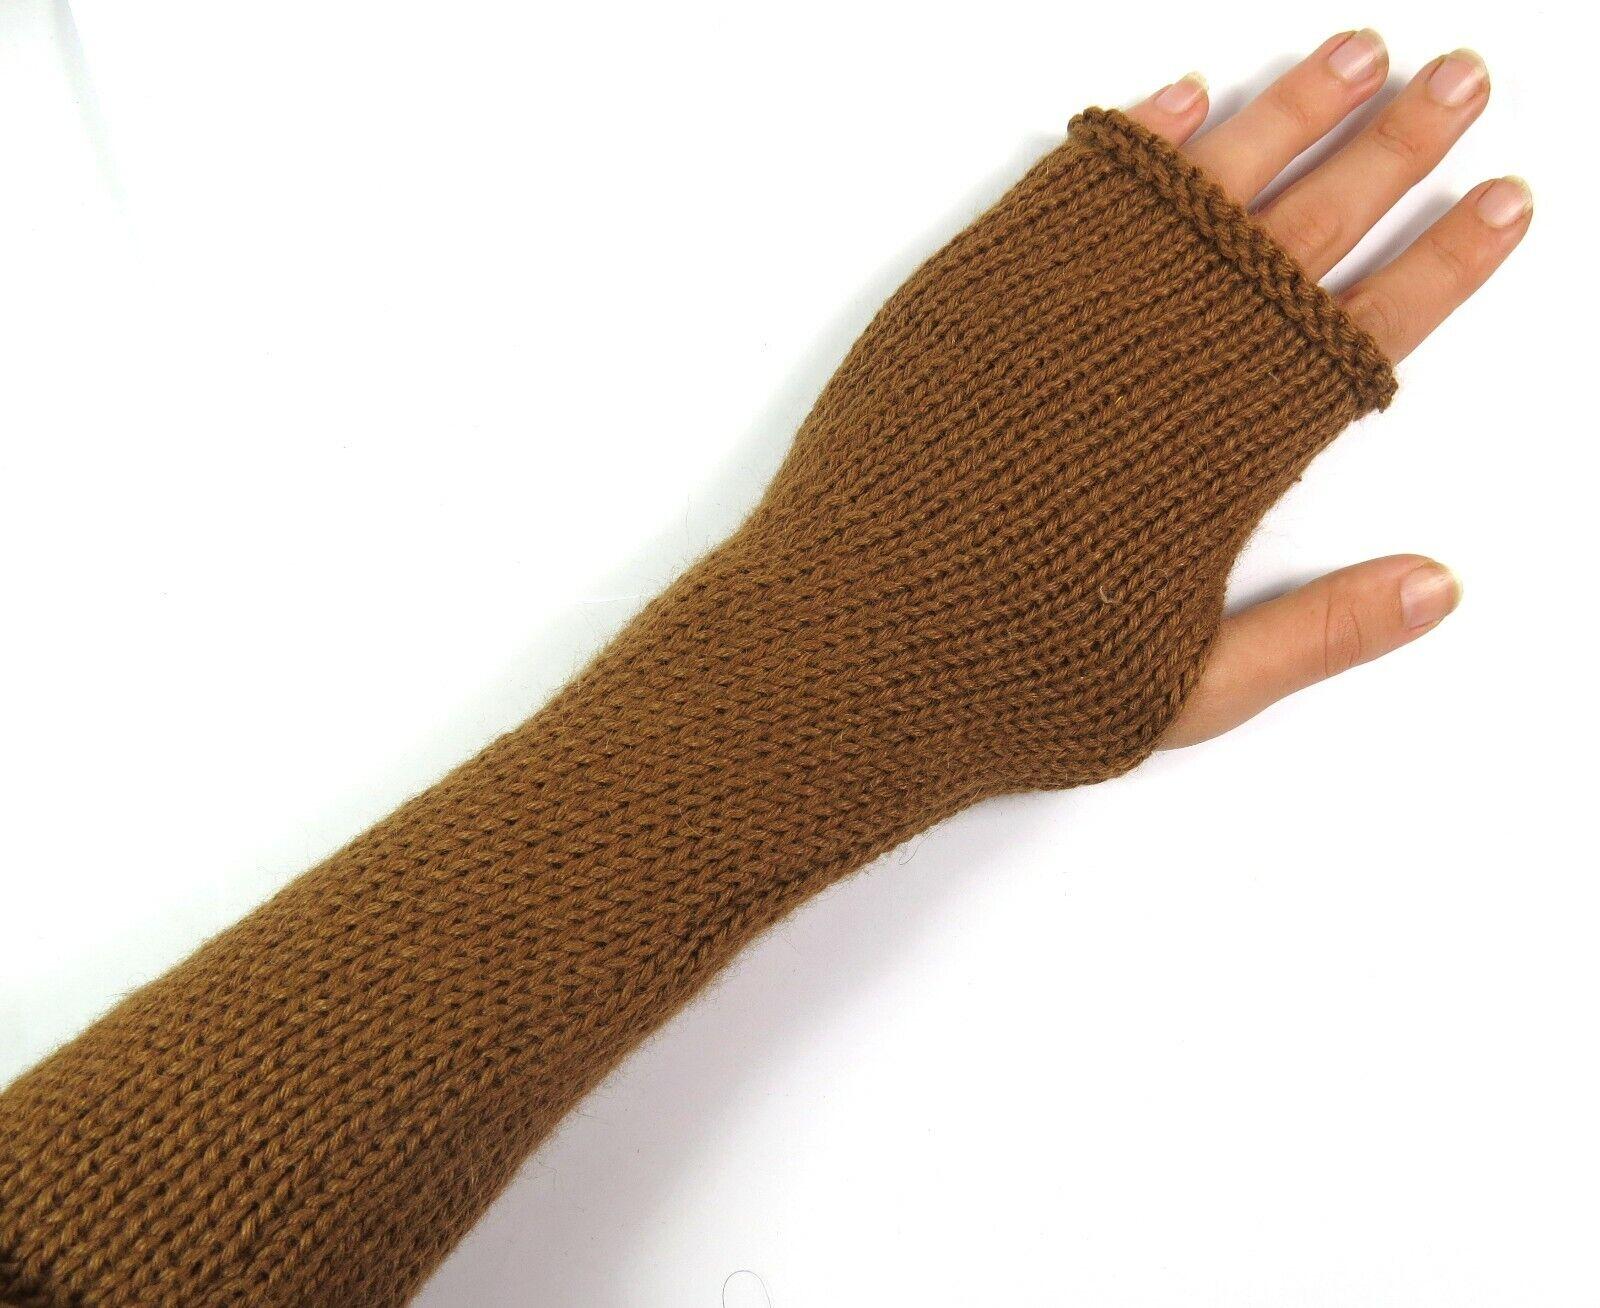 Pulswarmer Hand Stulpen 100% Alpaka Wolle Natur weich Warm Damen Hellbraun